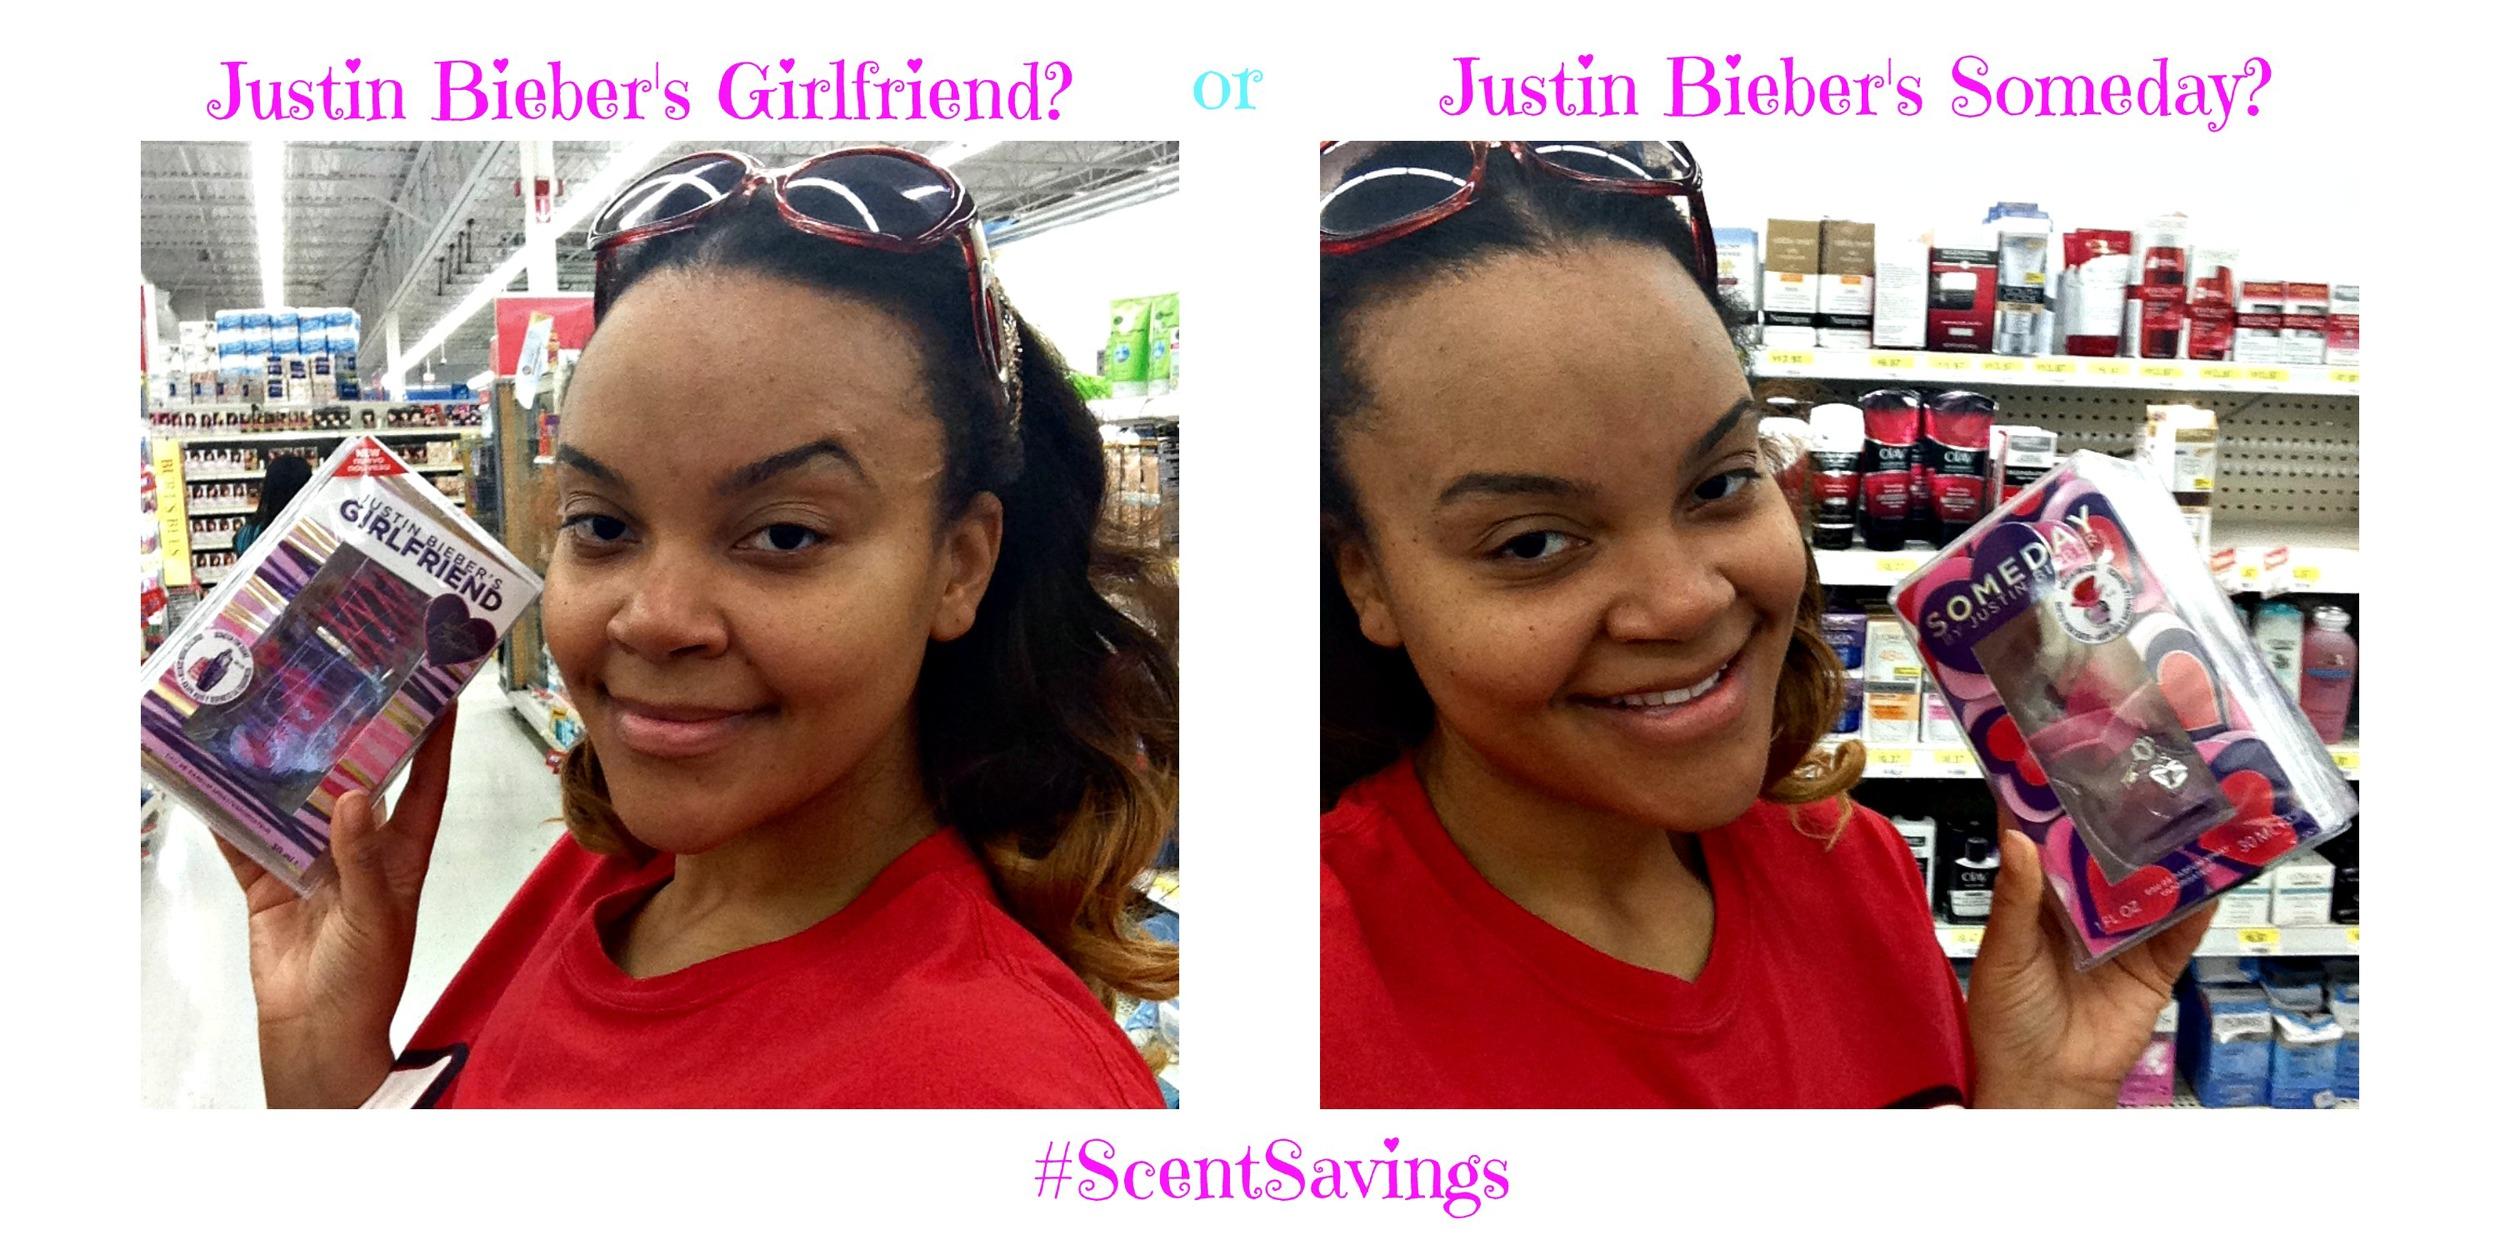 perfume, #scentsavings, #cbias, #shop, Justin Bieber, CBG191310